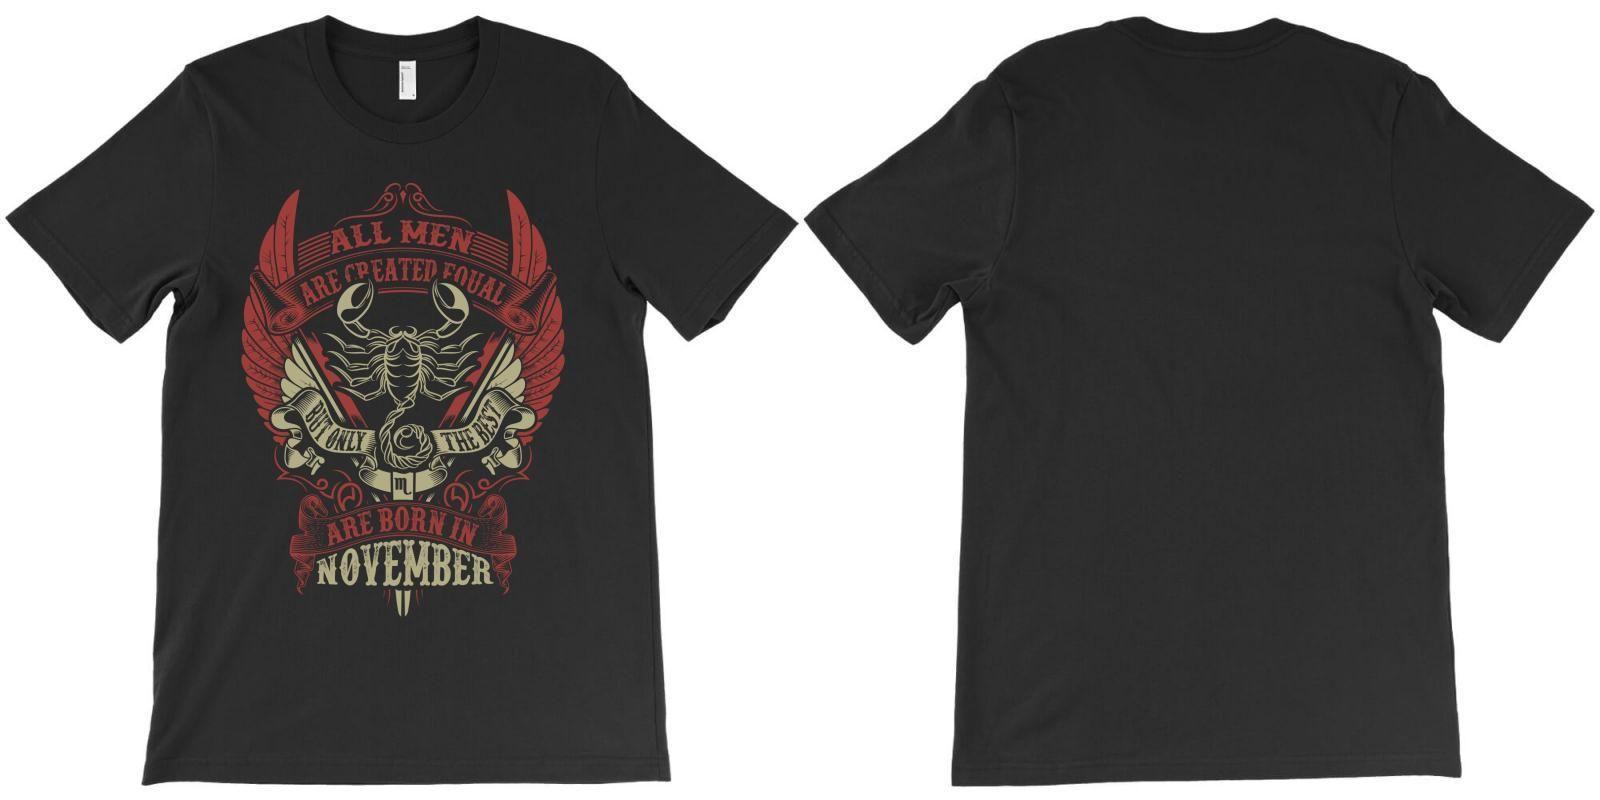 bcd36bf1 T-Shirt - Artistshot Laboratory | Shirts tee | Pinterest | T shirt ...